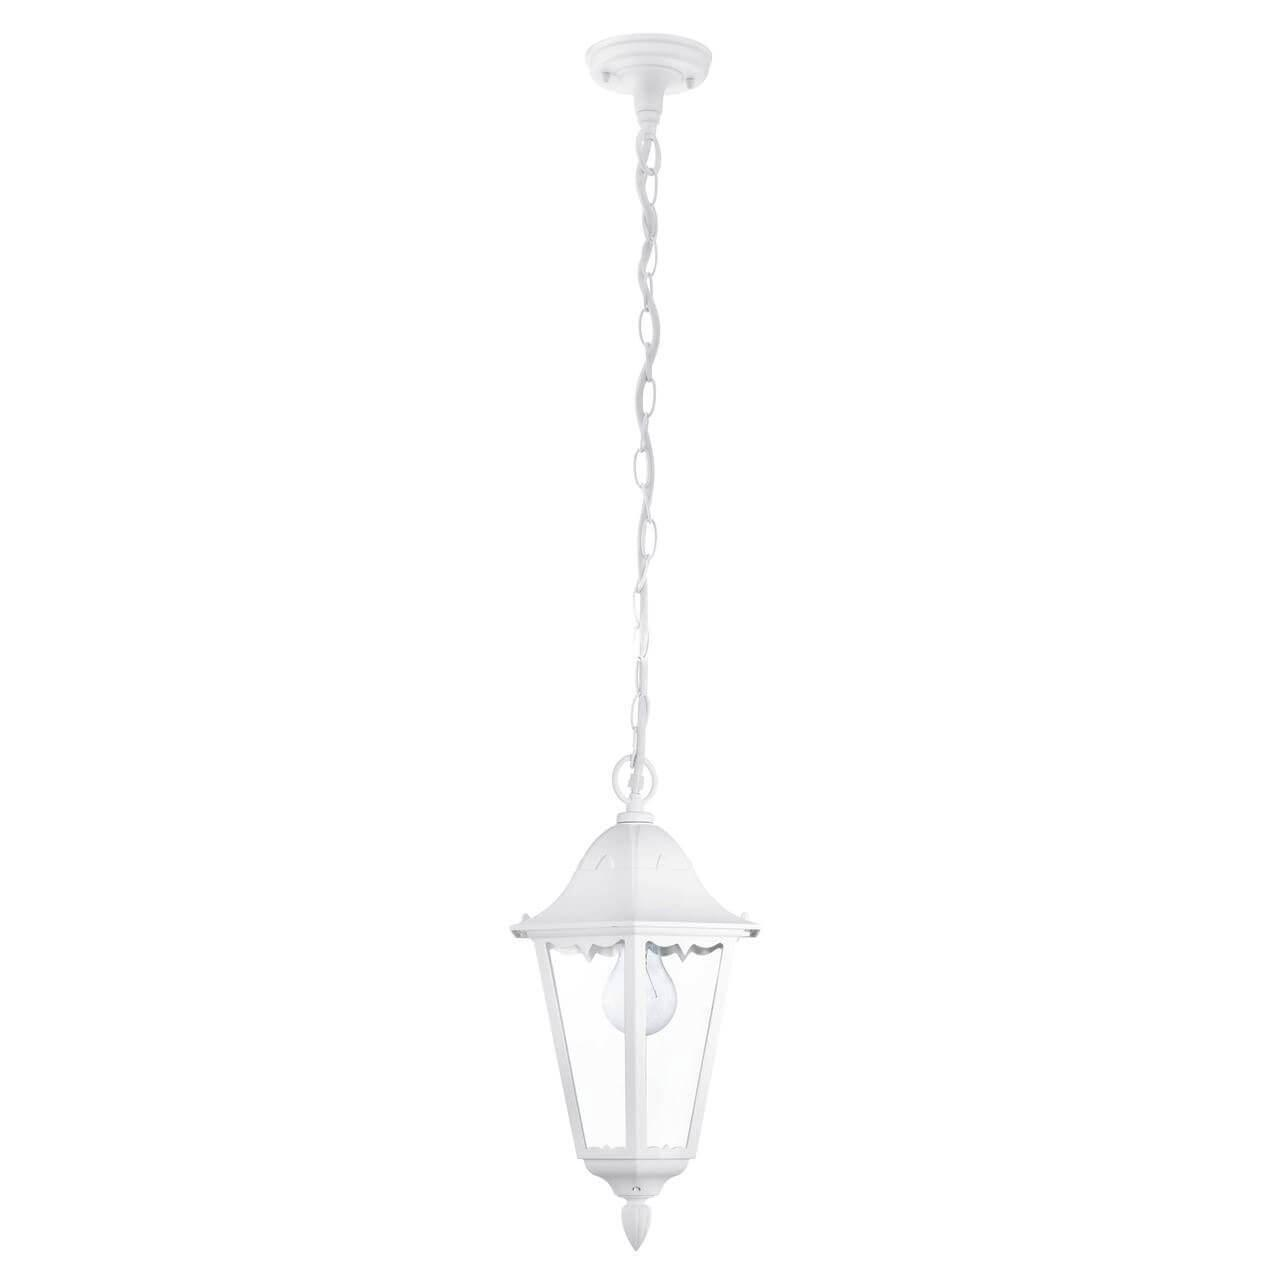 цена на Уличный светильник Eglo 93444, E27